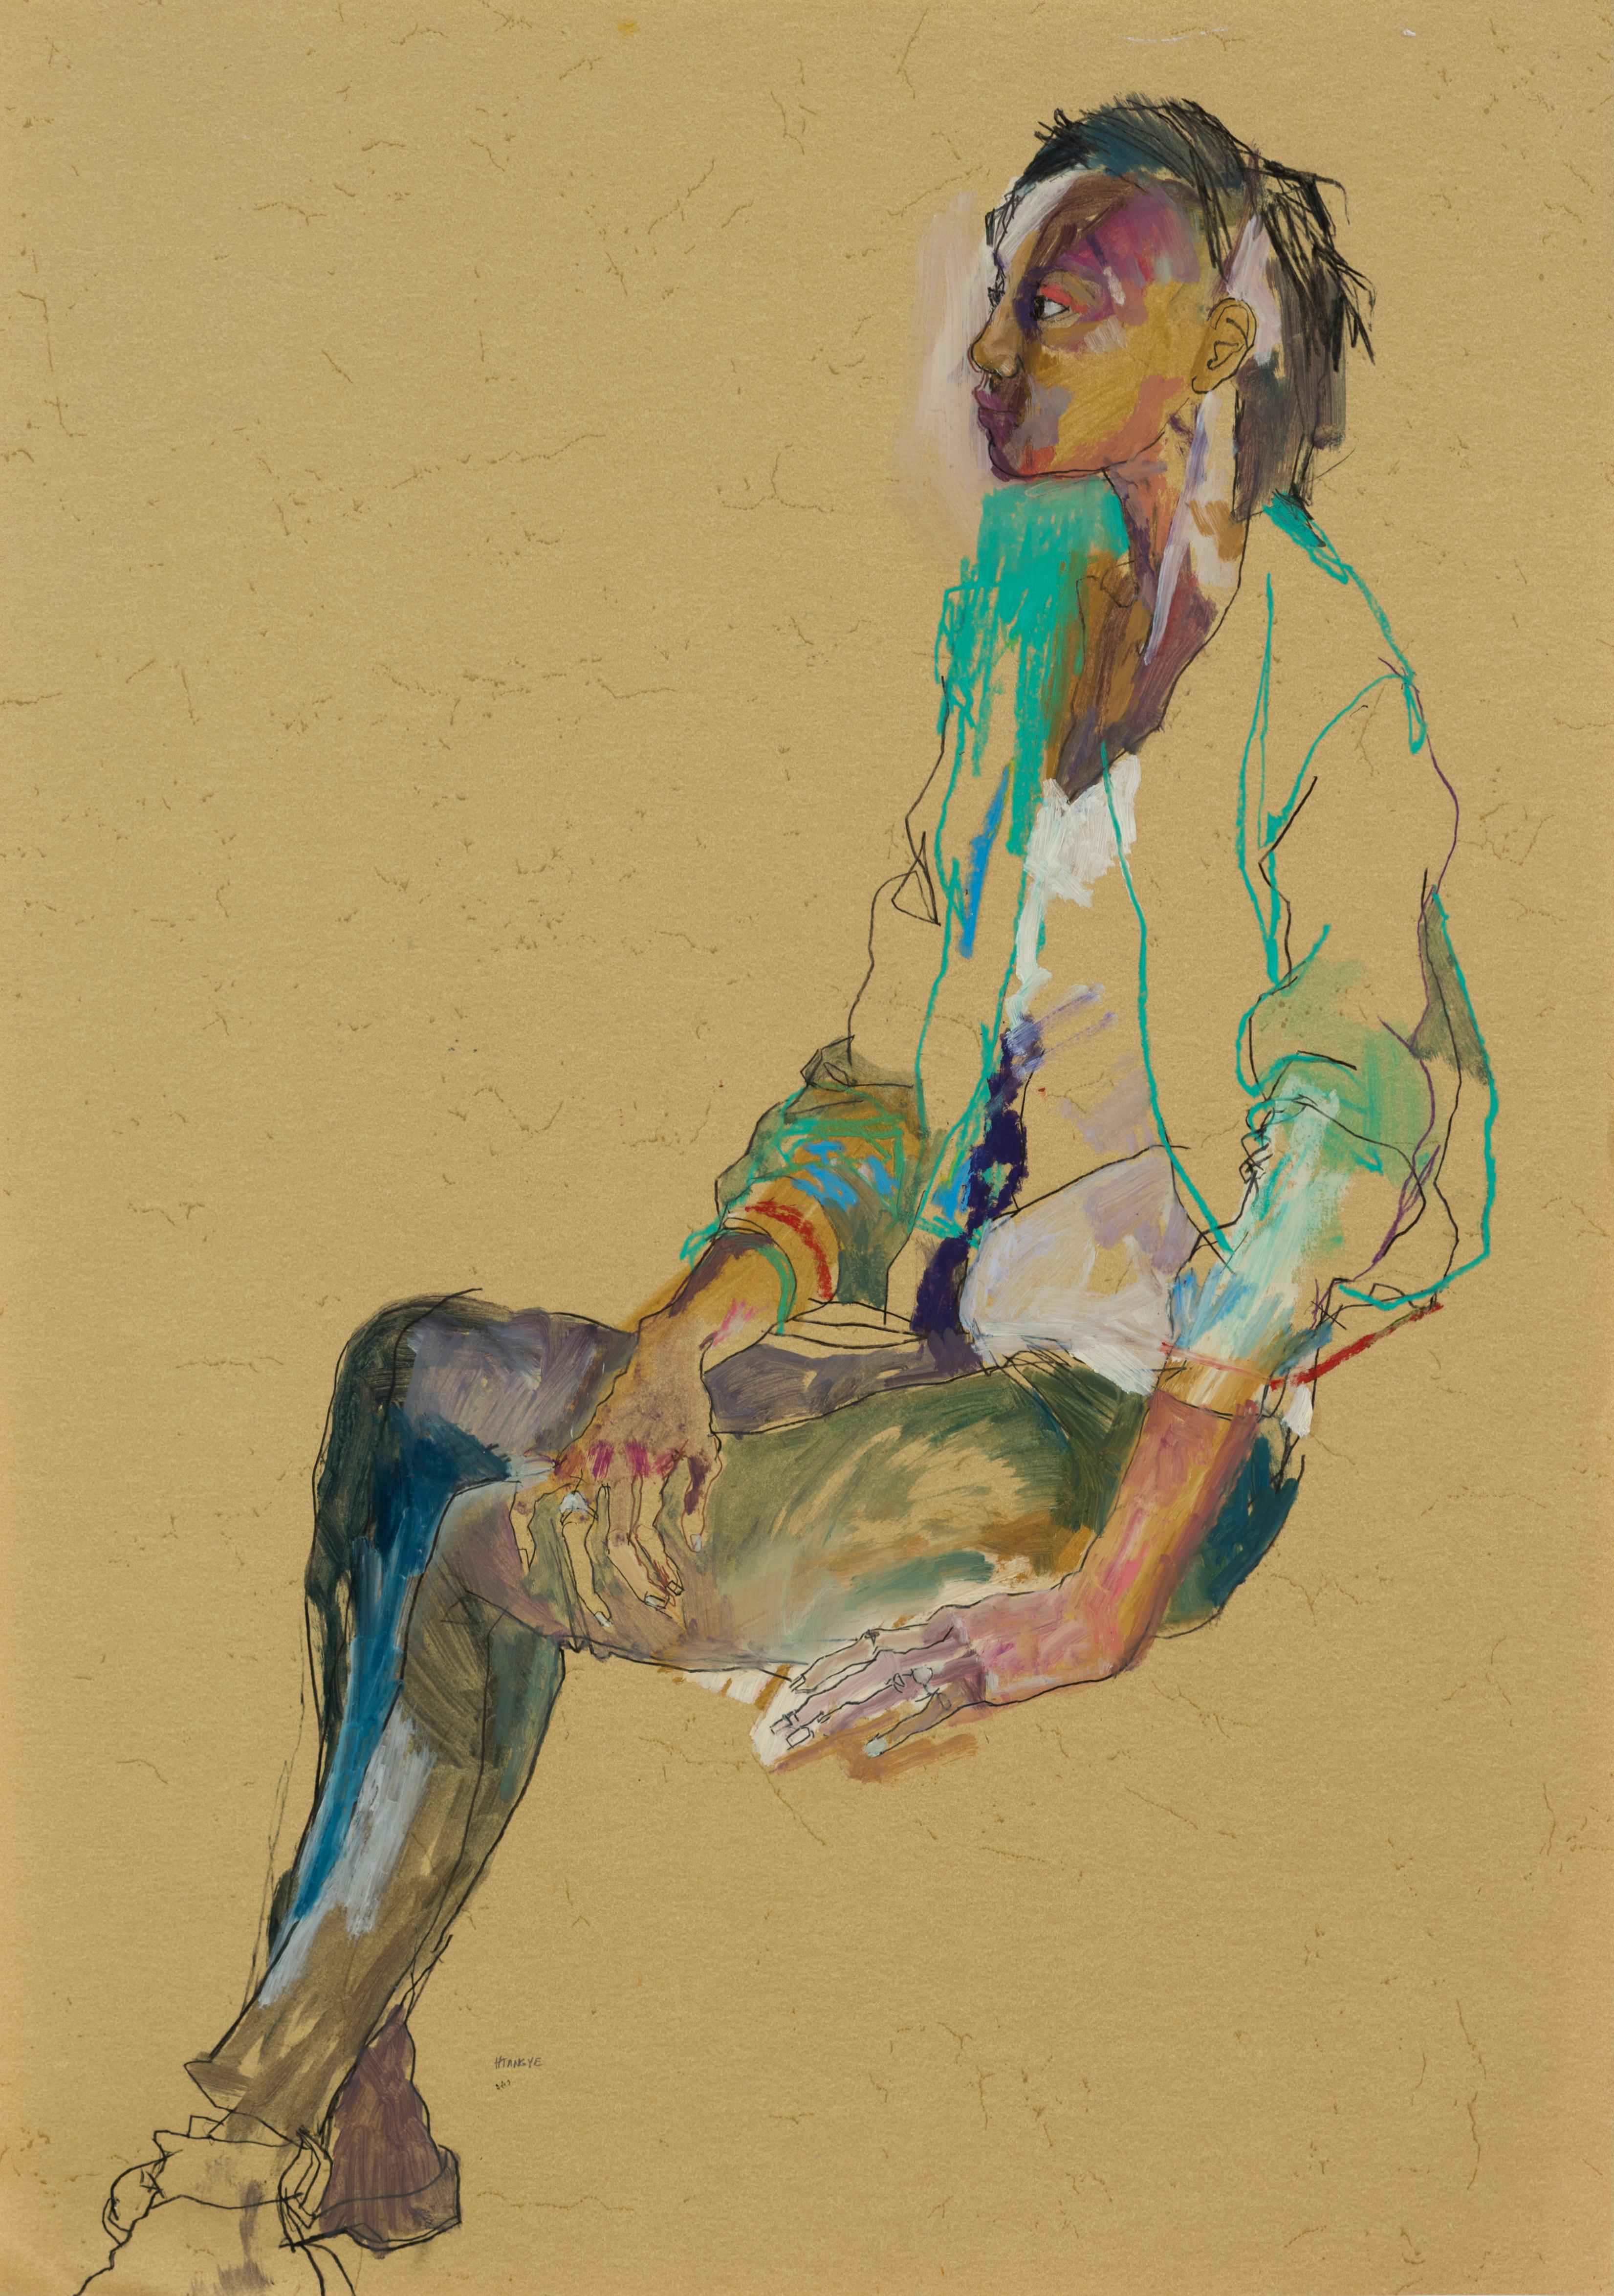 Anji (Sitting, Profile - Green Jacket), Mixed media on ochre paper